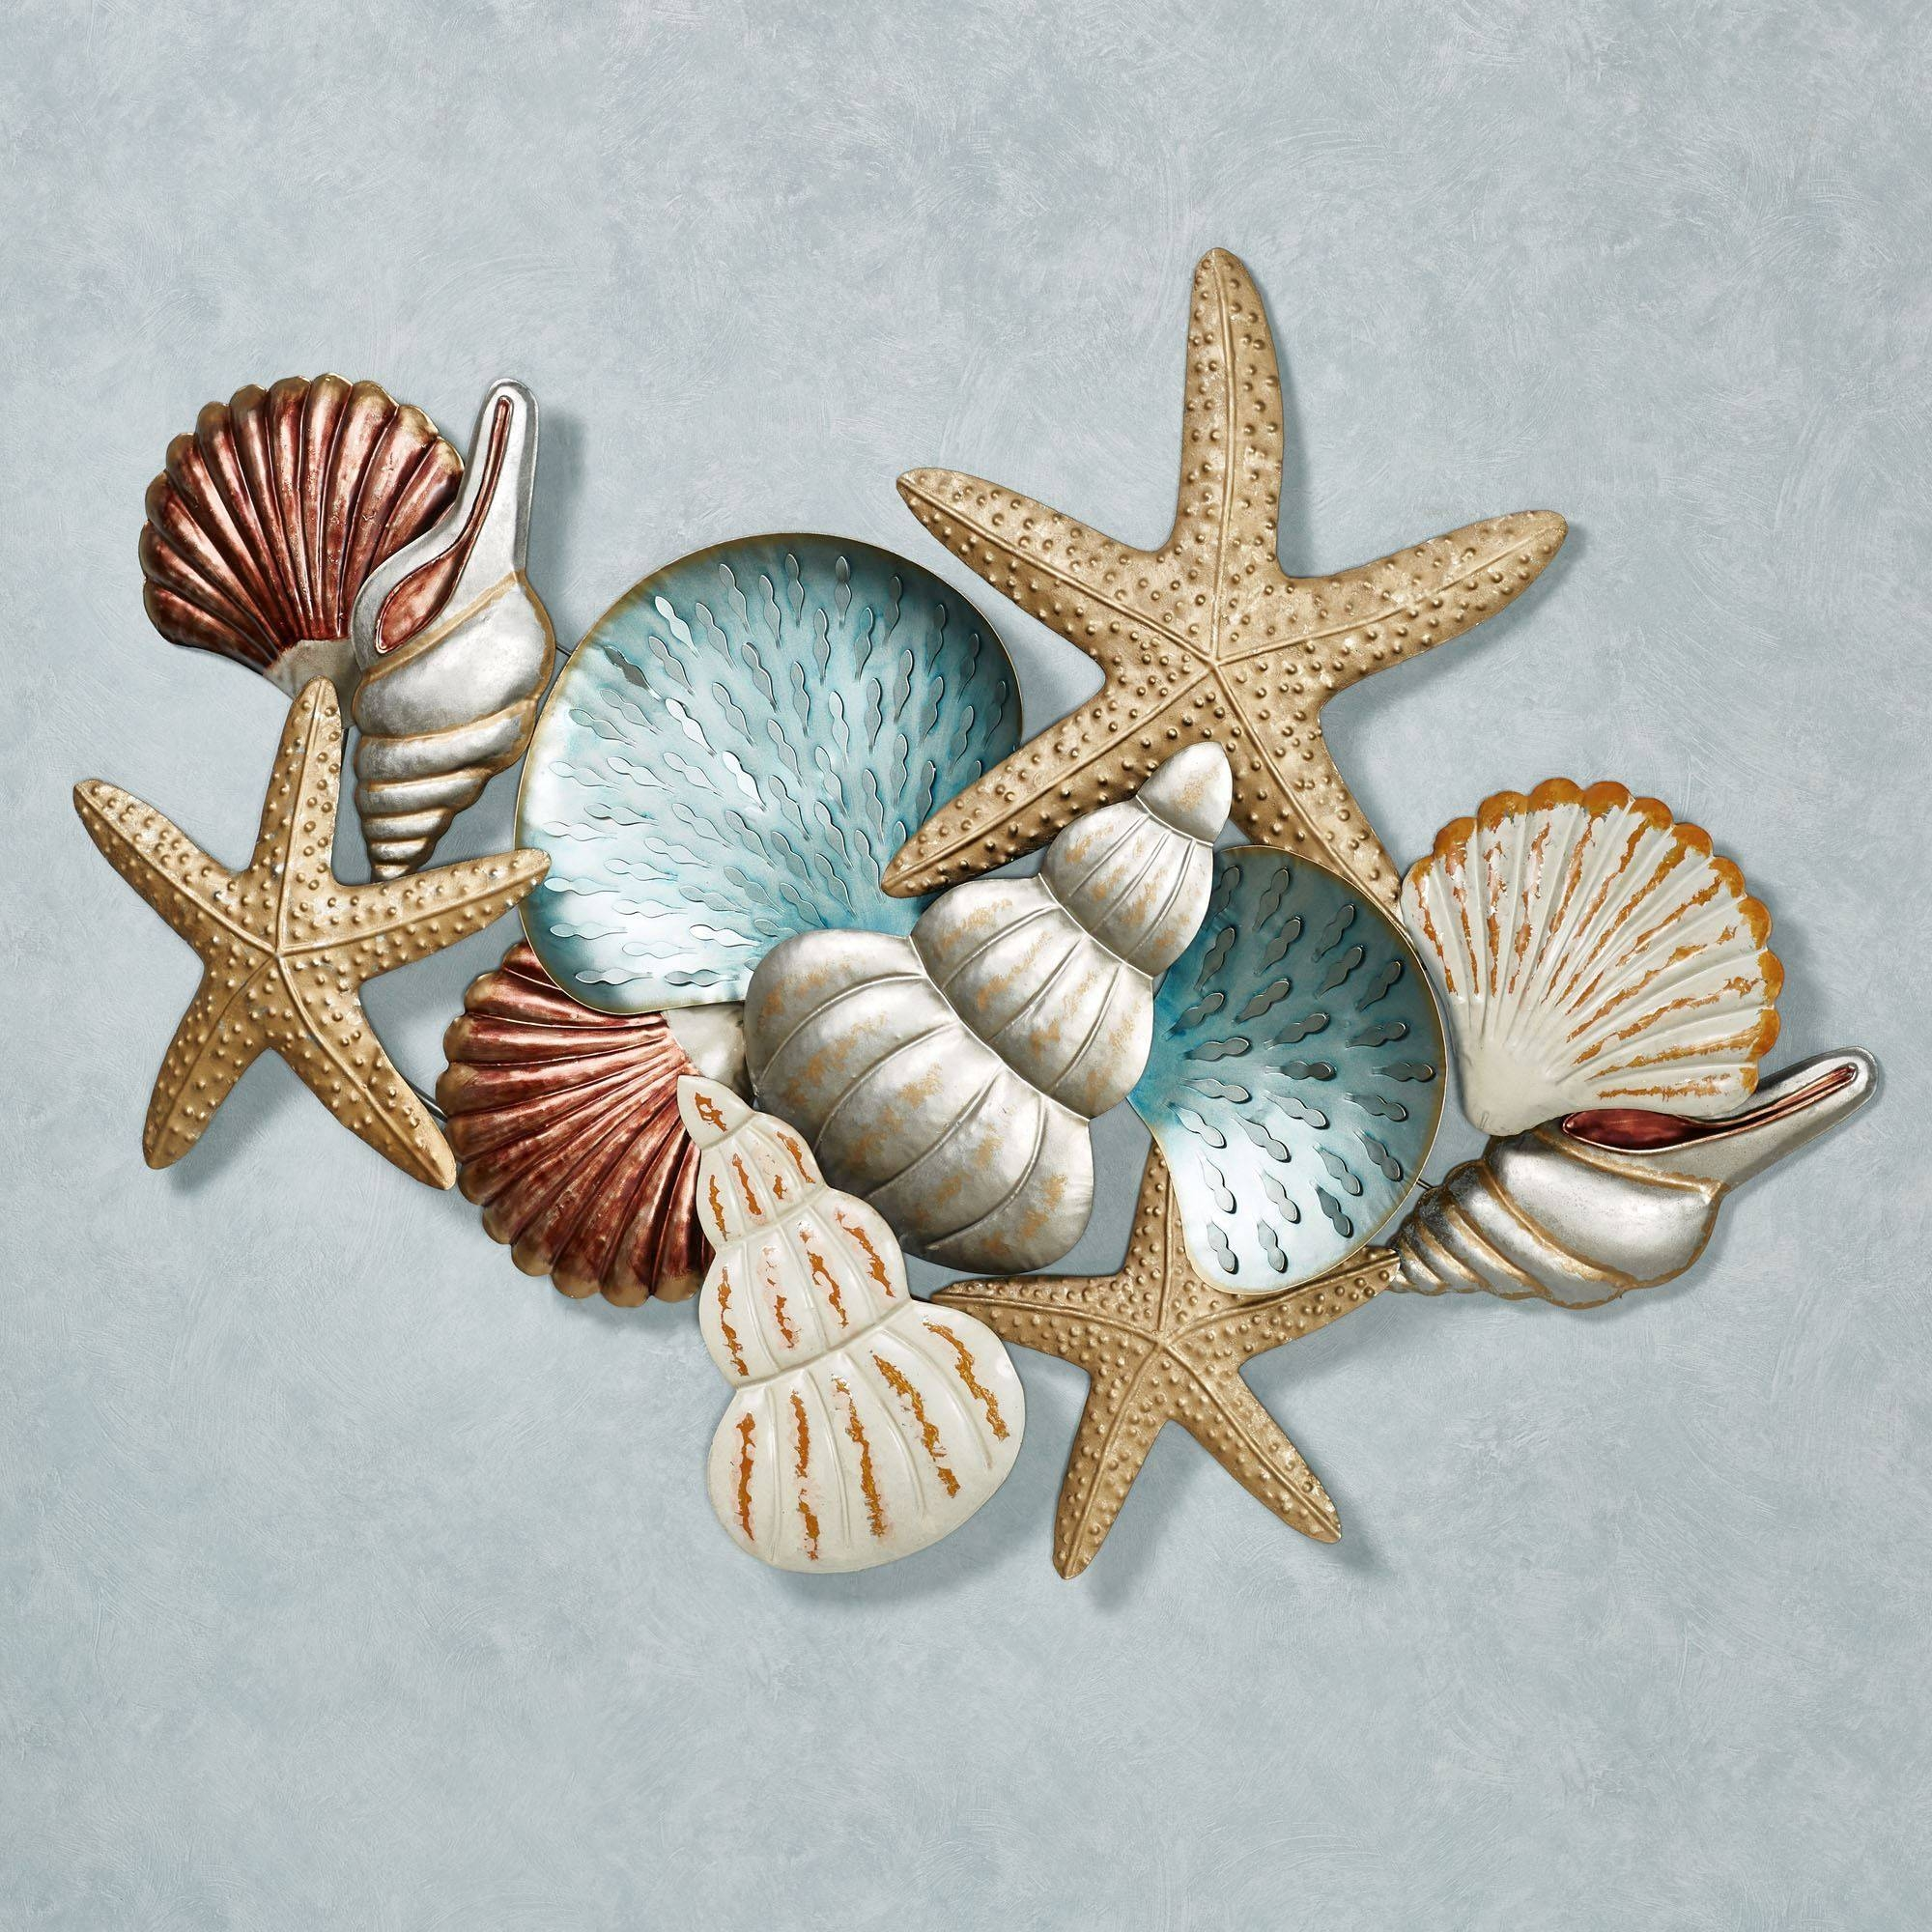 Ocean Collage Metal Wall Art Regarding Latest Coastal Metal Wall Art (Gallery 1 of 20)